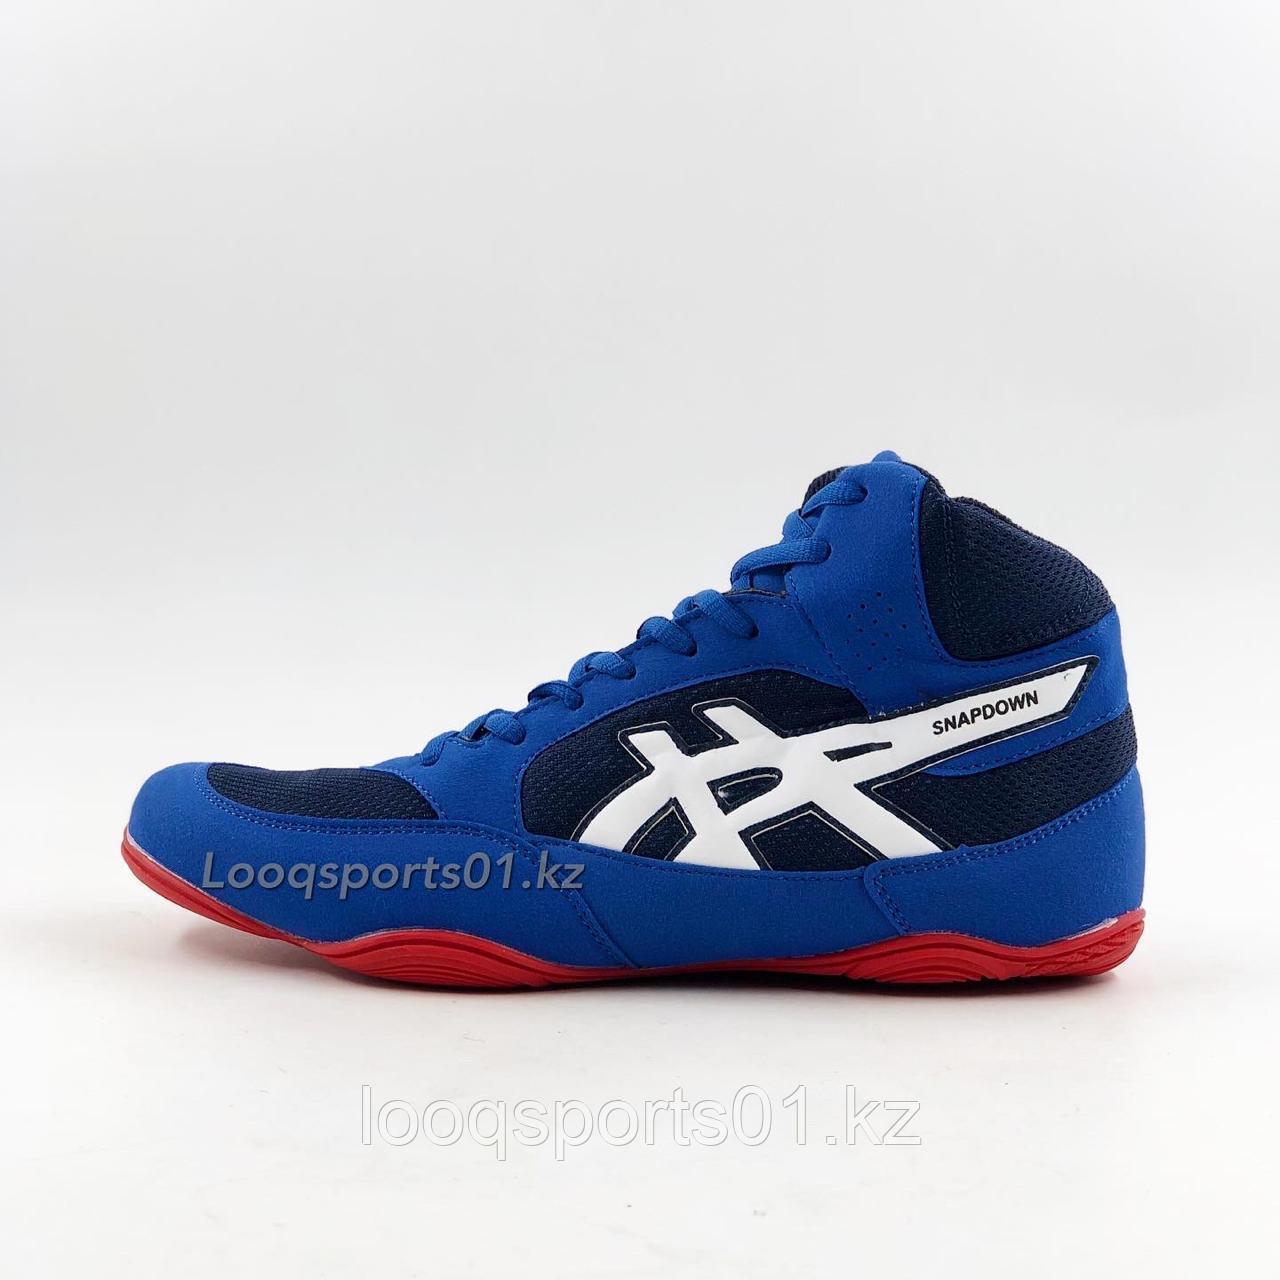 Борцовки Asics Snapdown (обувь для борьба)